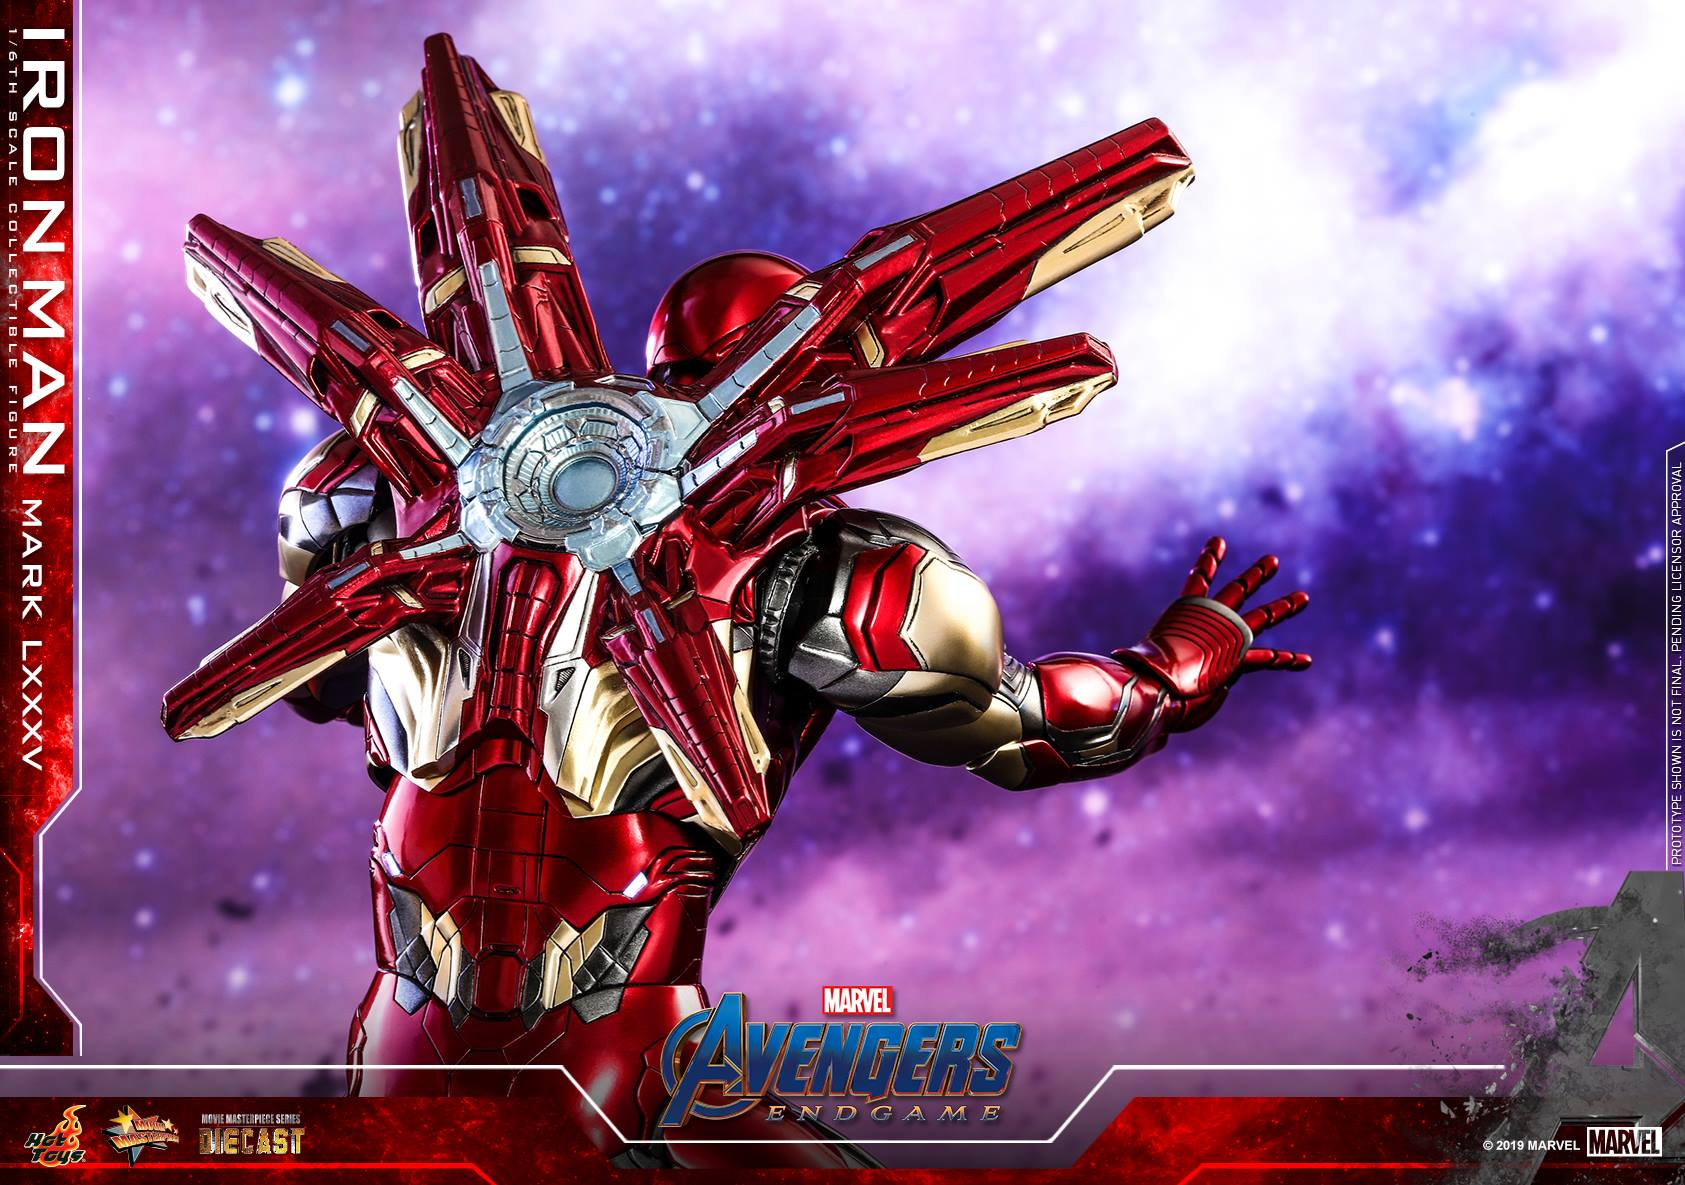 Hot Toys Avengers Endgame Armored Thanos & Iron Mark 45 Figures! - Marvel  Toy News